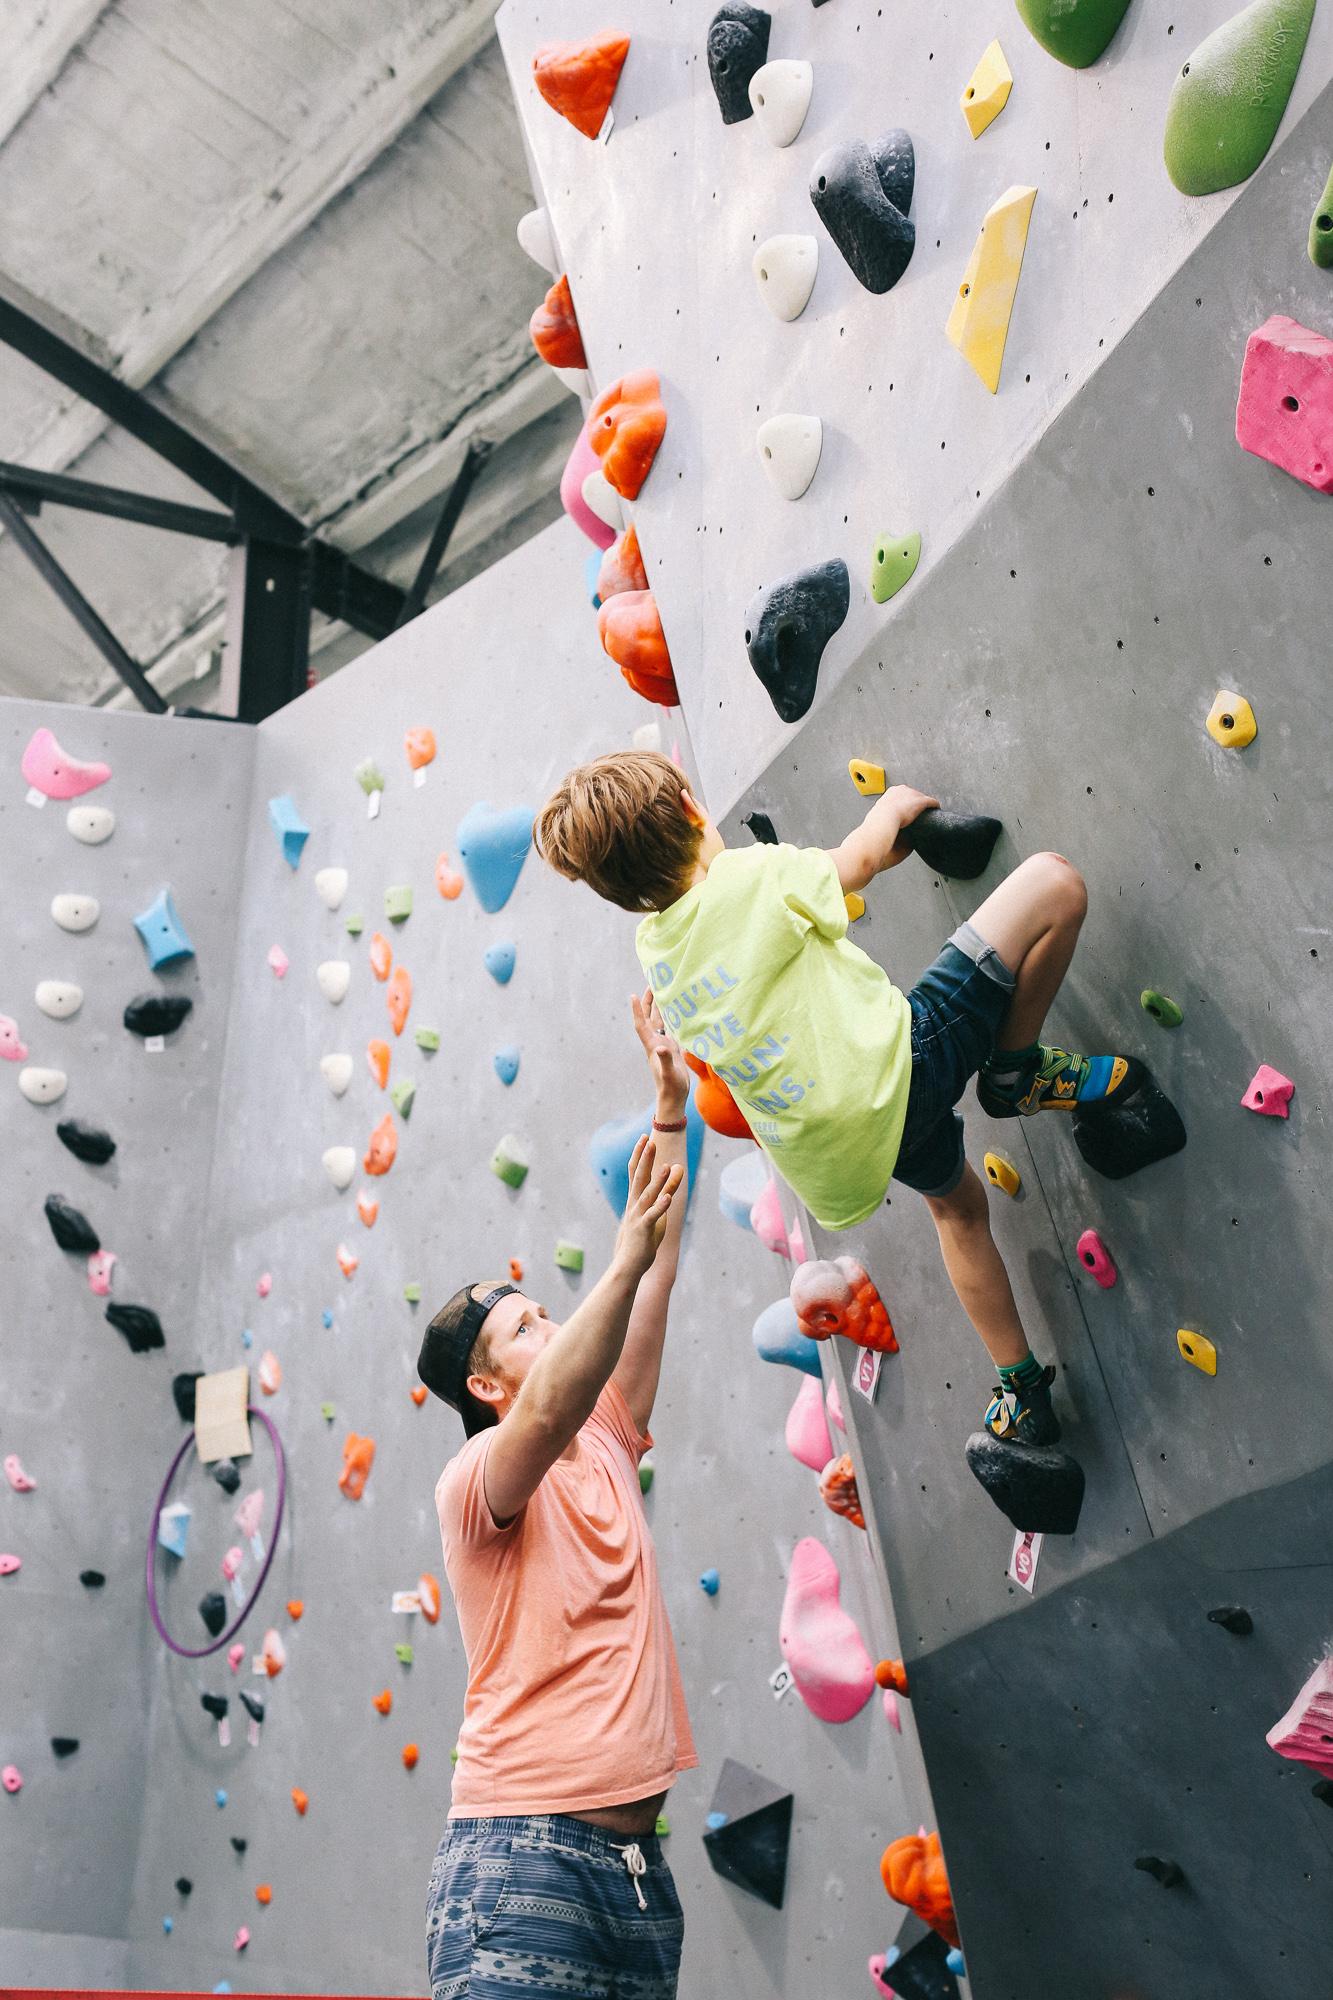 Terra Firma Bouldering | Youth Rec Teams | 9-11 Year Olds